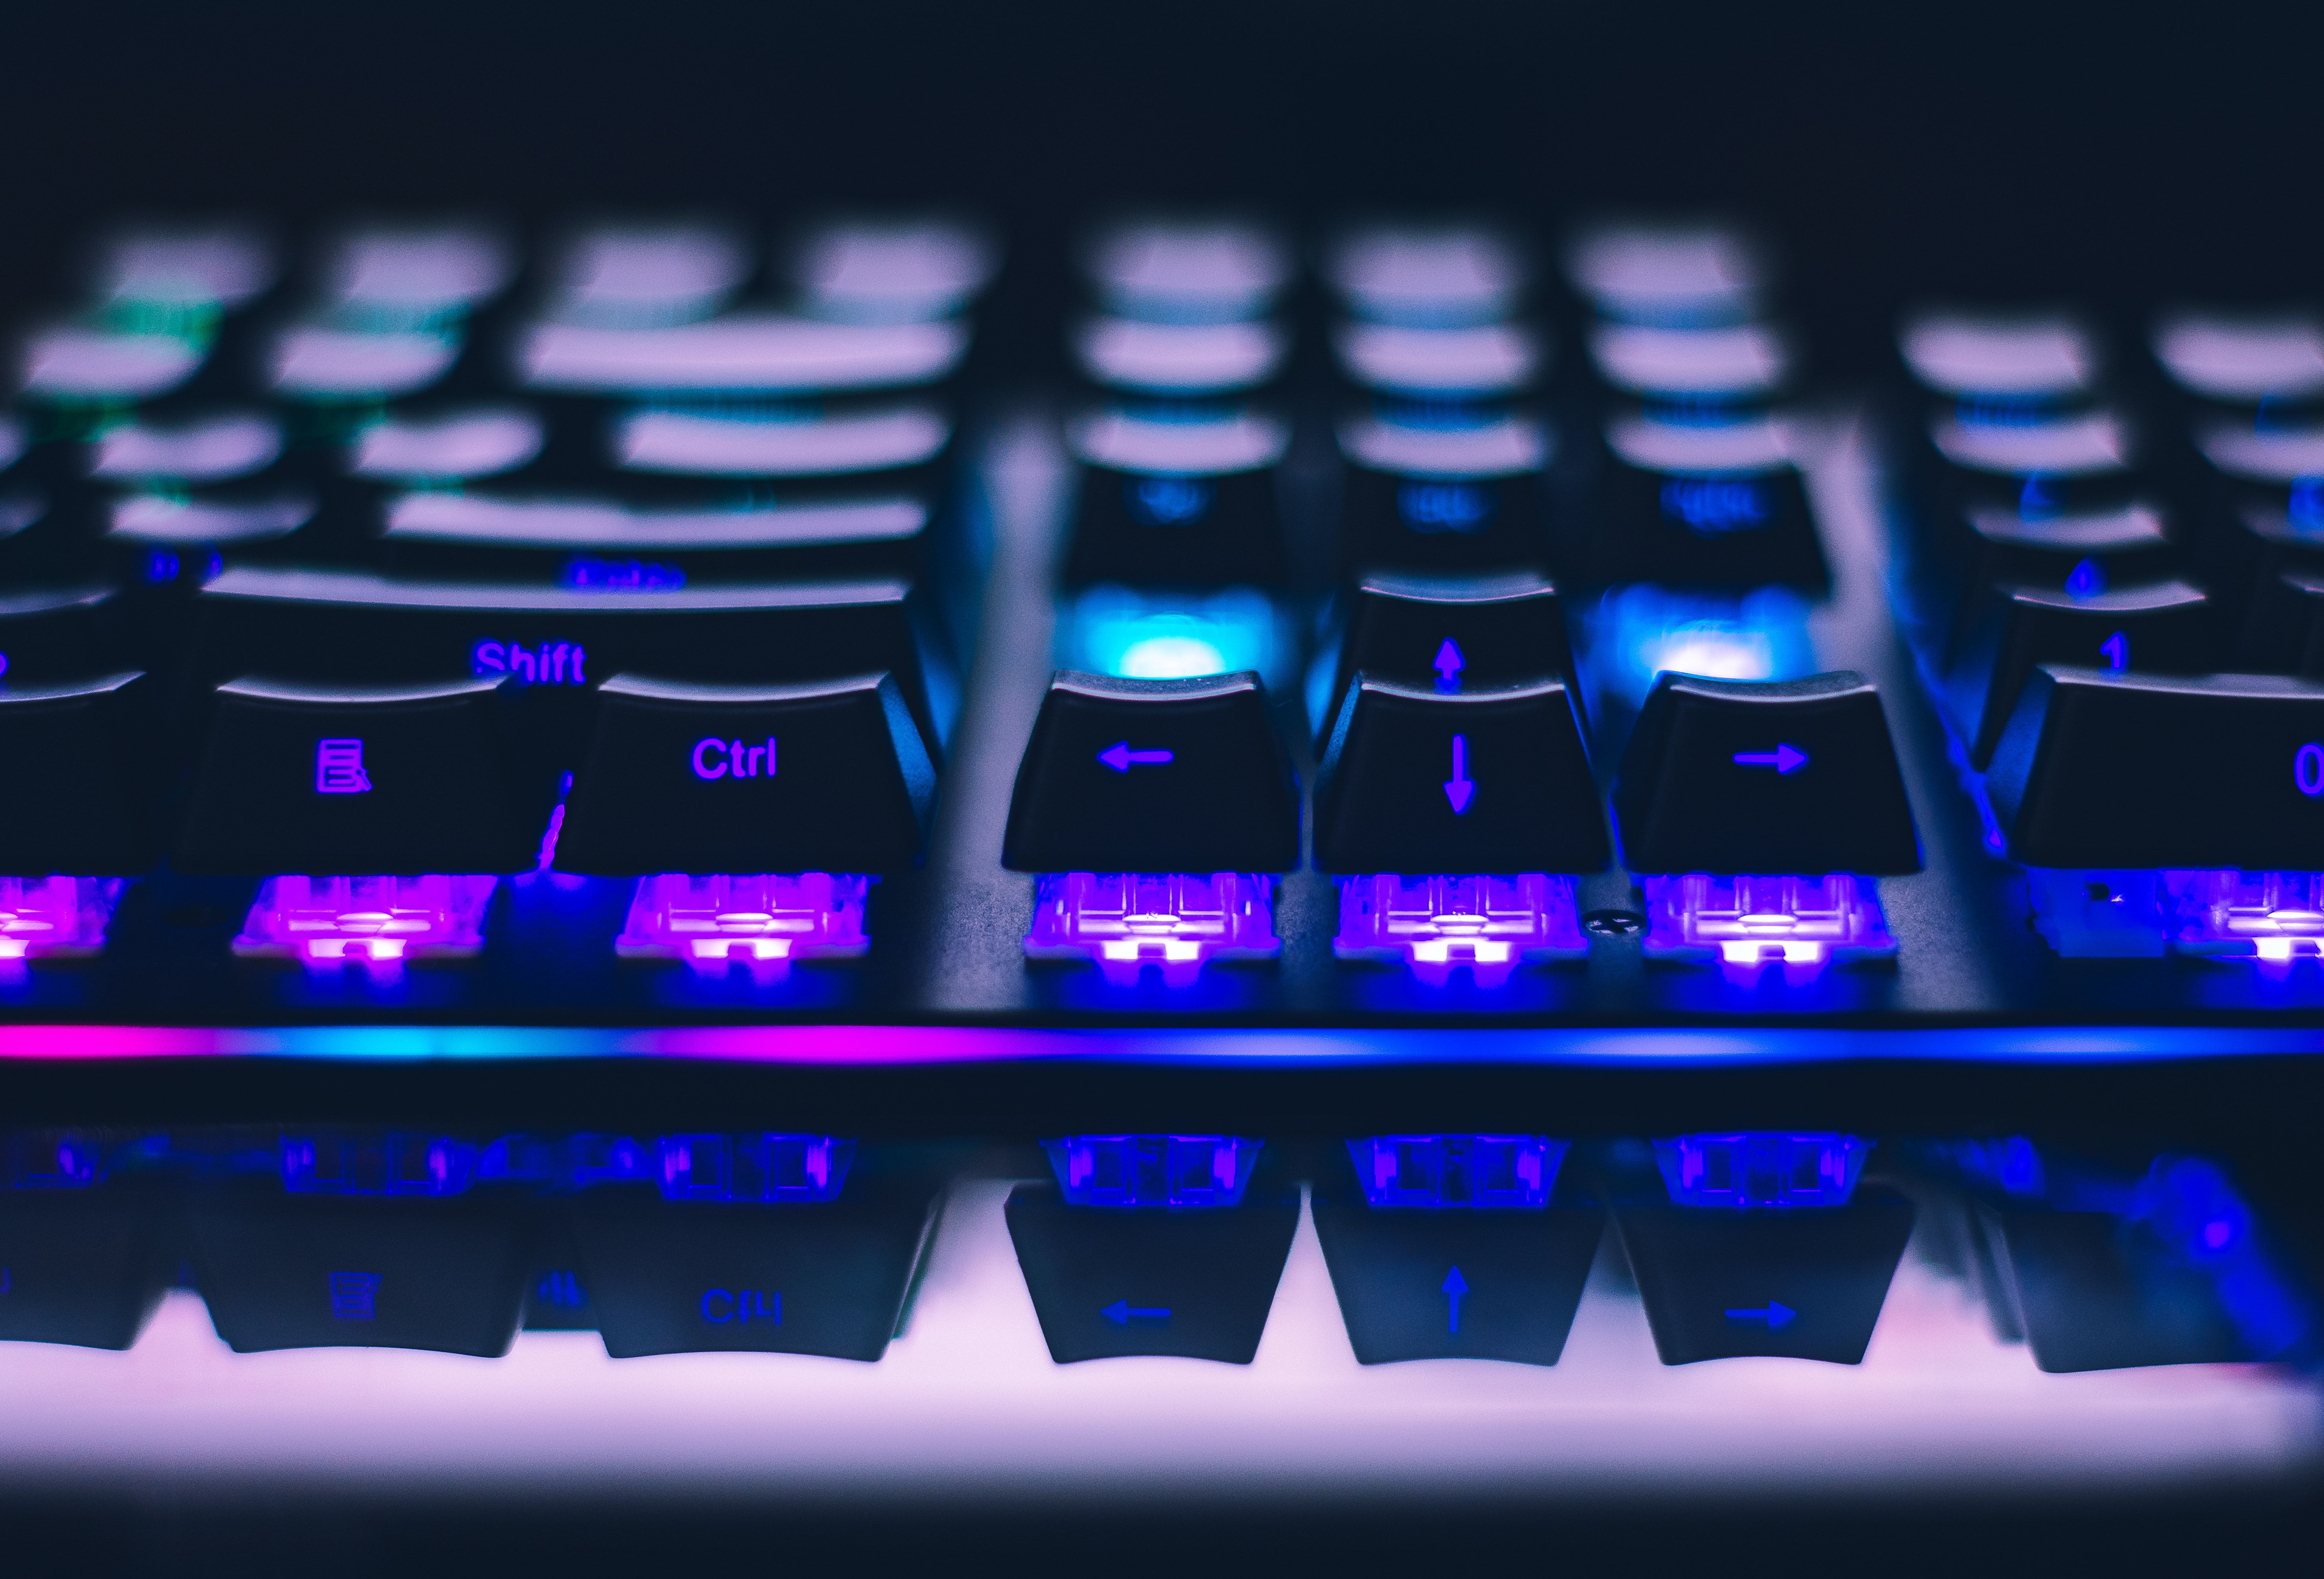 Gaming Keyboard 20k Wallpapers   Wallpaper Cave